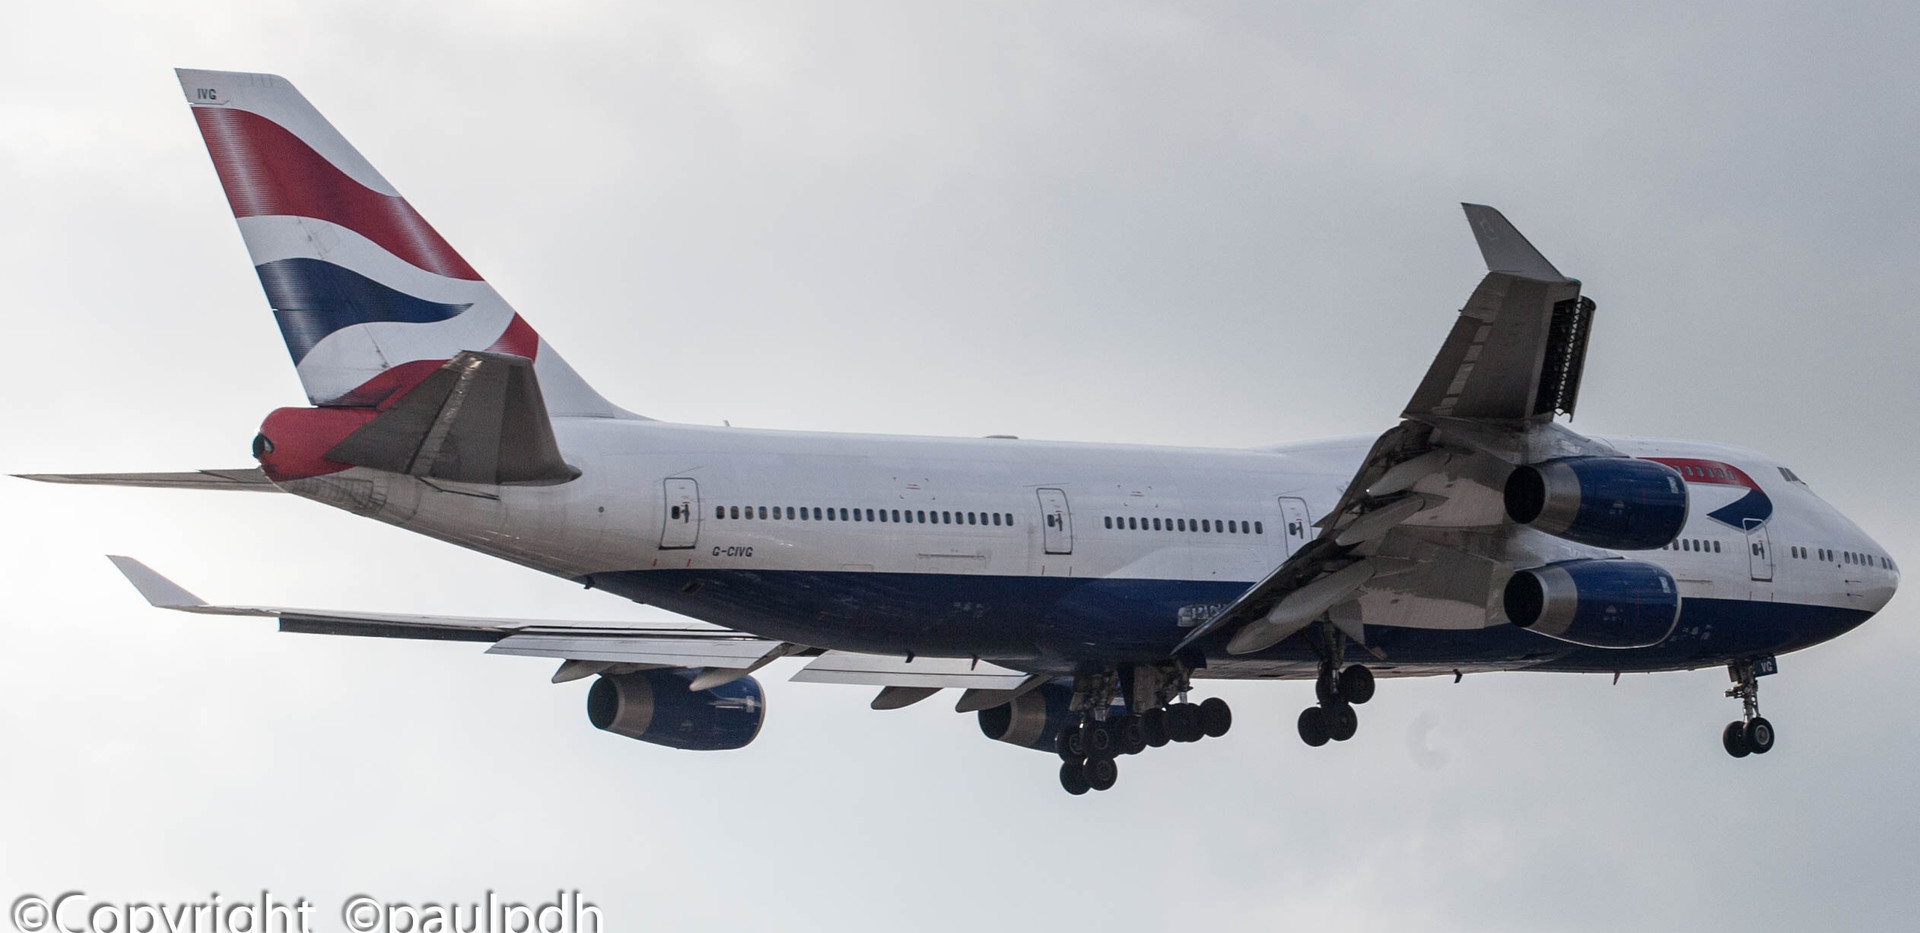 boeing-747---msn-25813---g-civg--1-of-1-